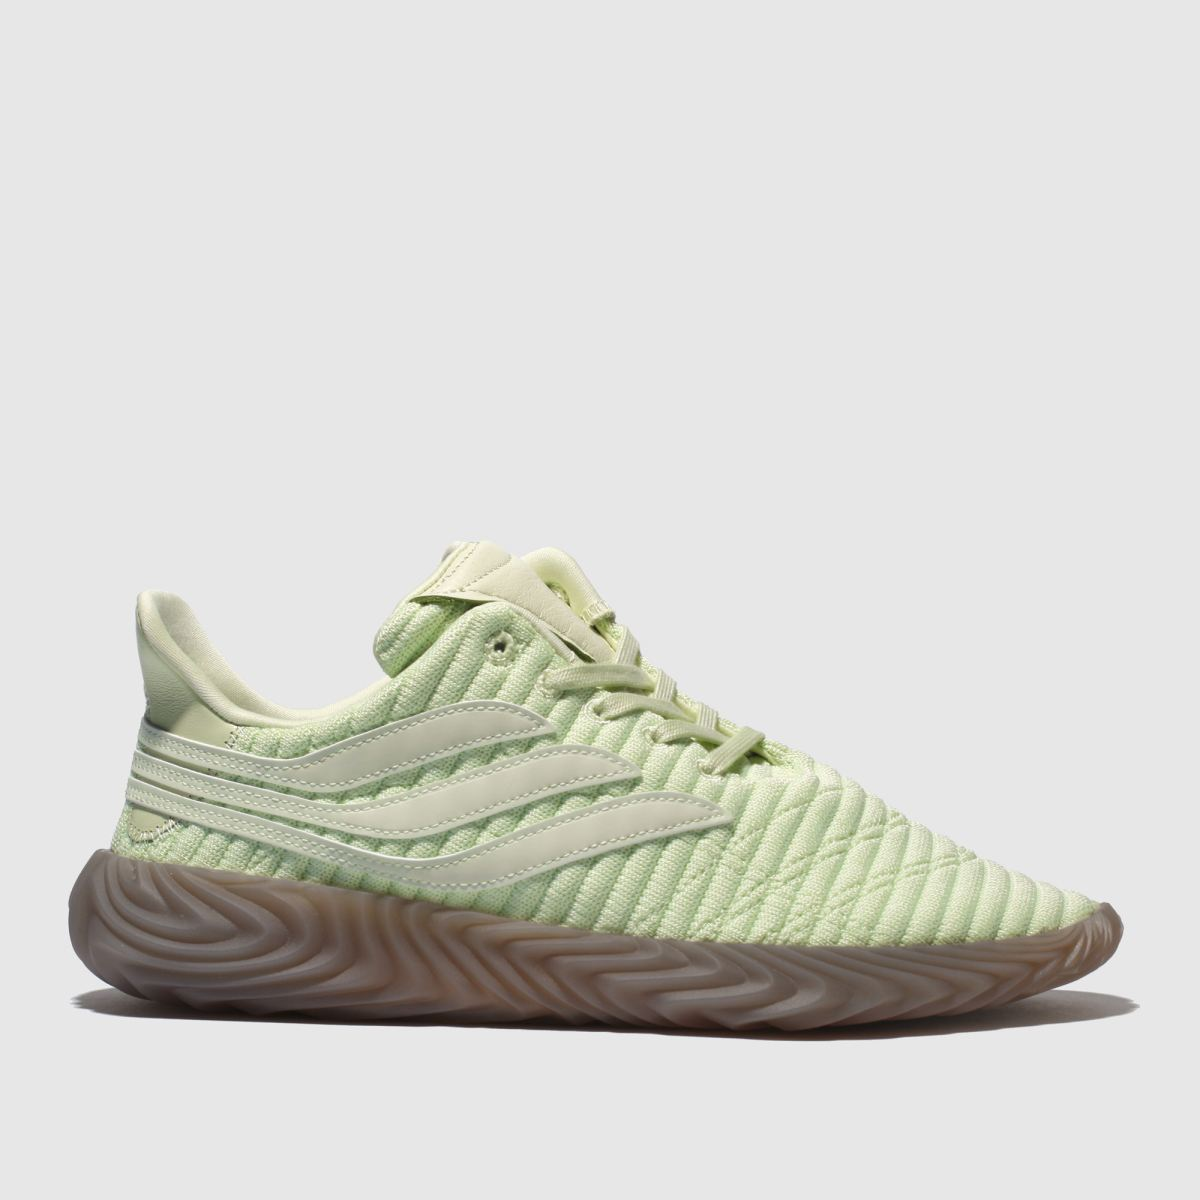 Adidas Light Green Sobakov Trainers